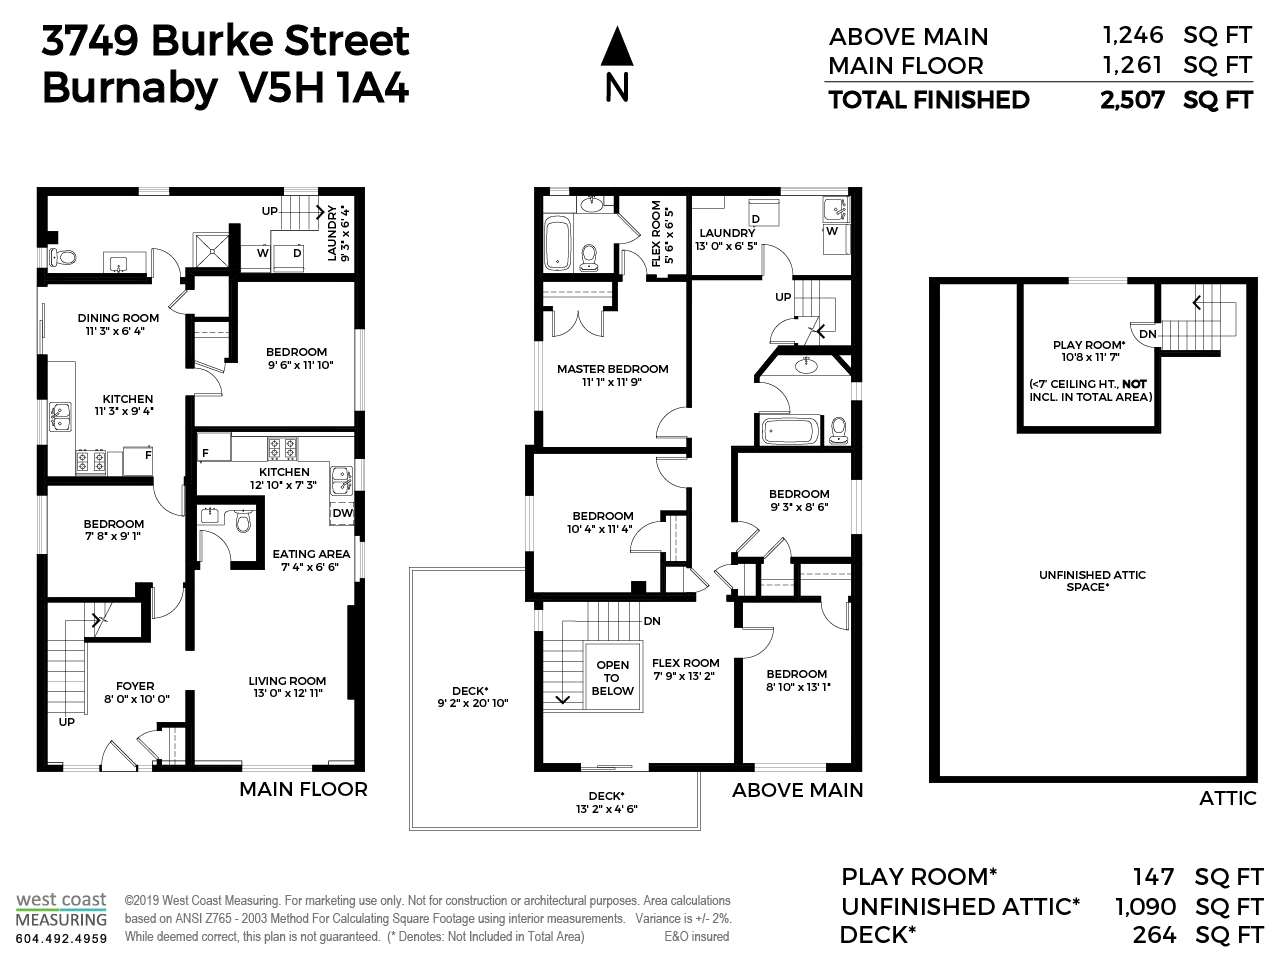 3749 BURKE STREET - MLS® # R2405401